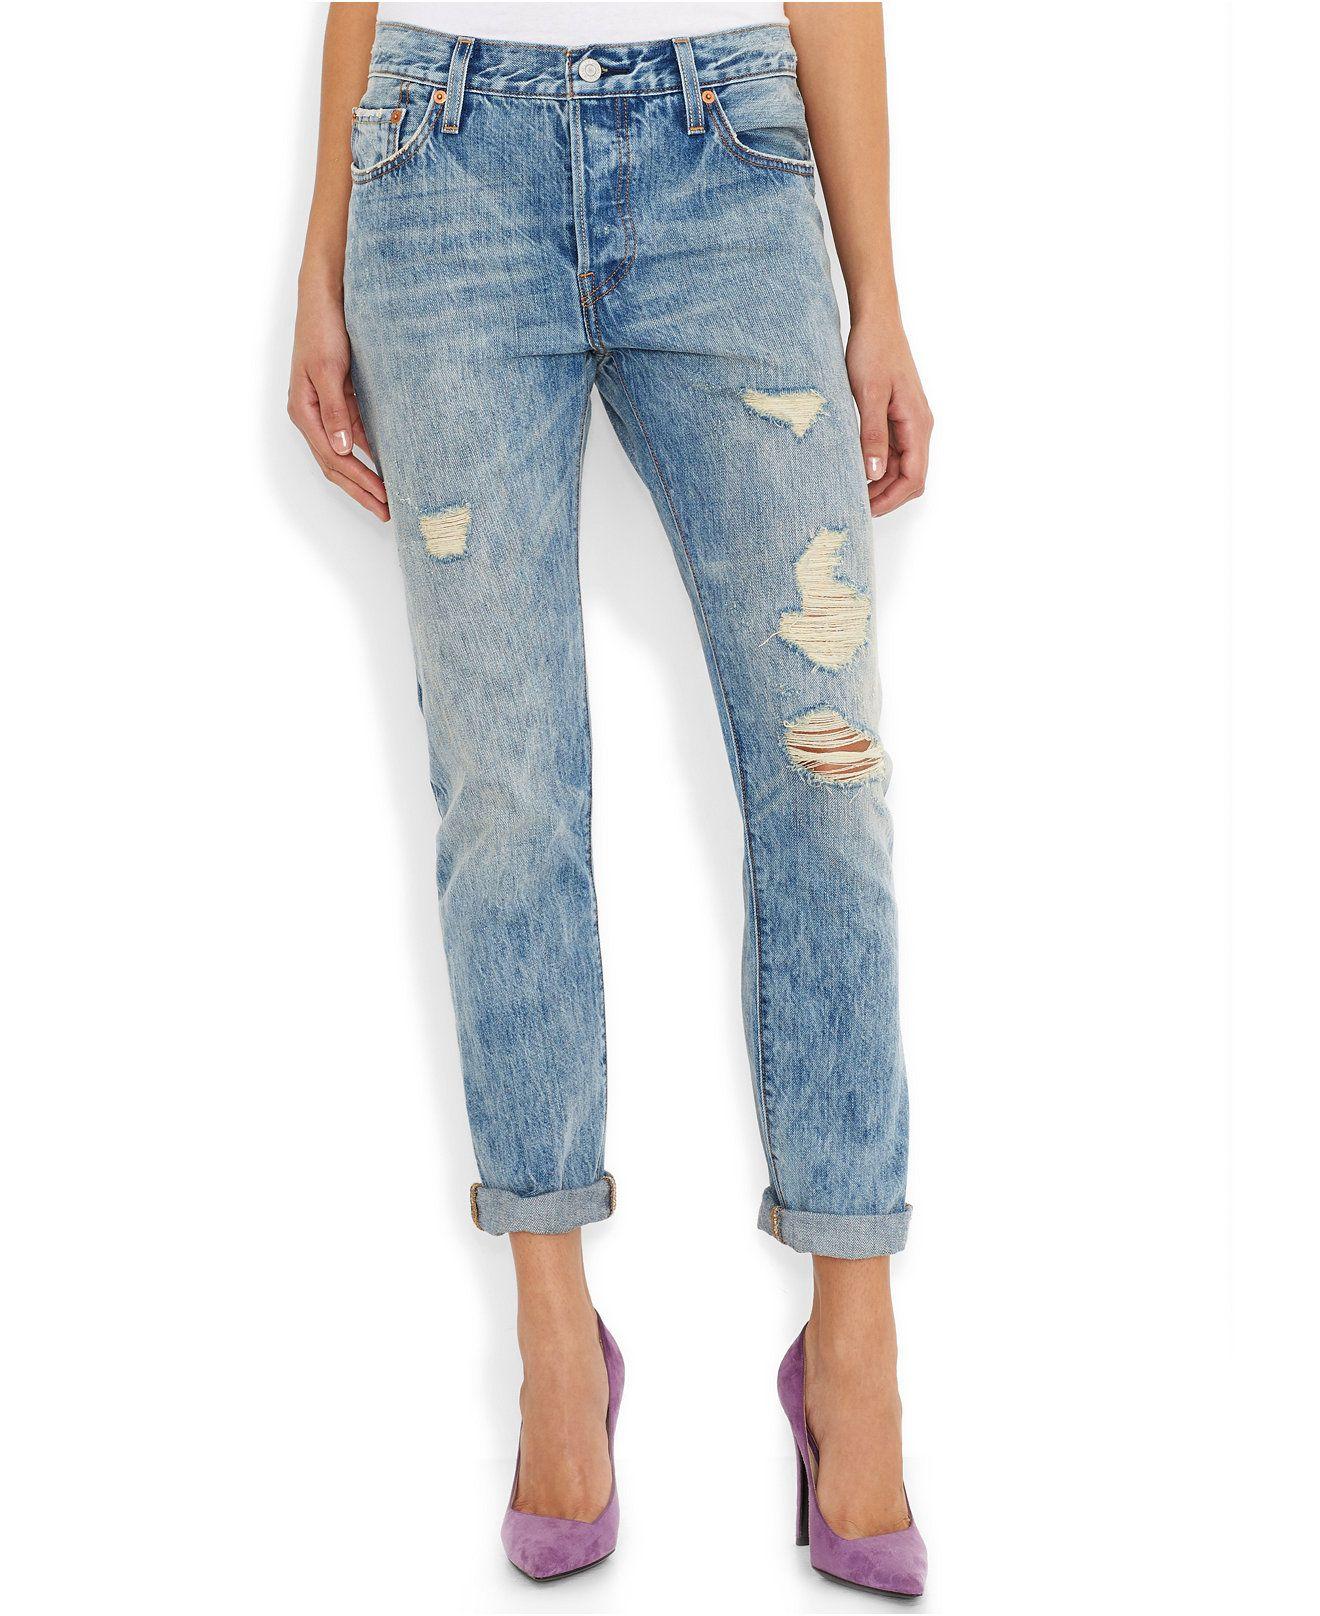 2e31392dc6b Levi's® 501 CT Customized and Tapered Boyfriend Jean, Torn Indigo - Juniors  Jeans - Macy's